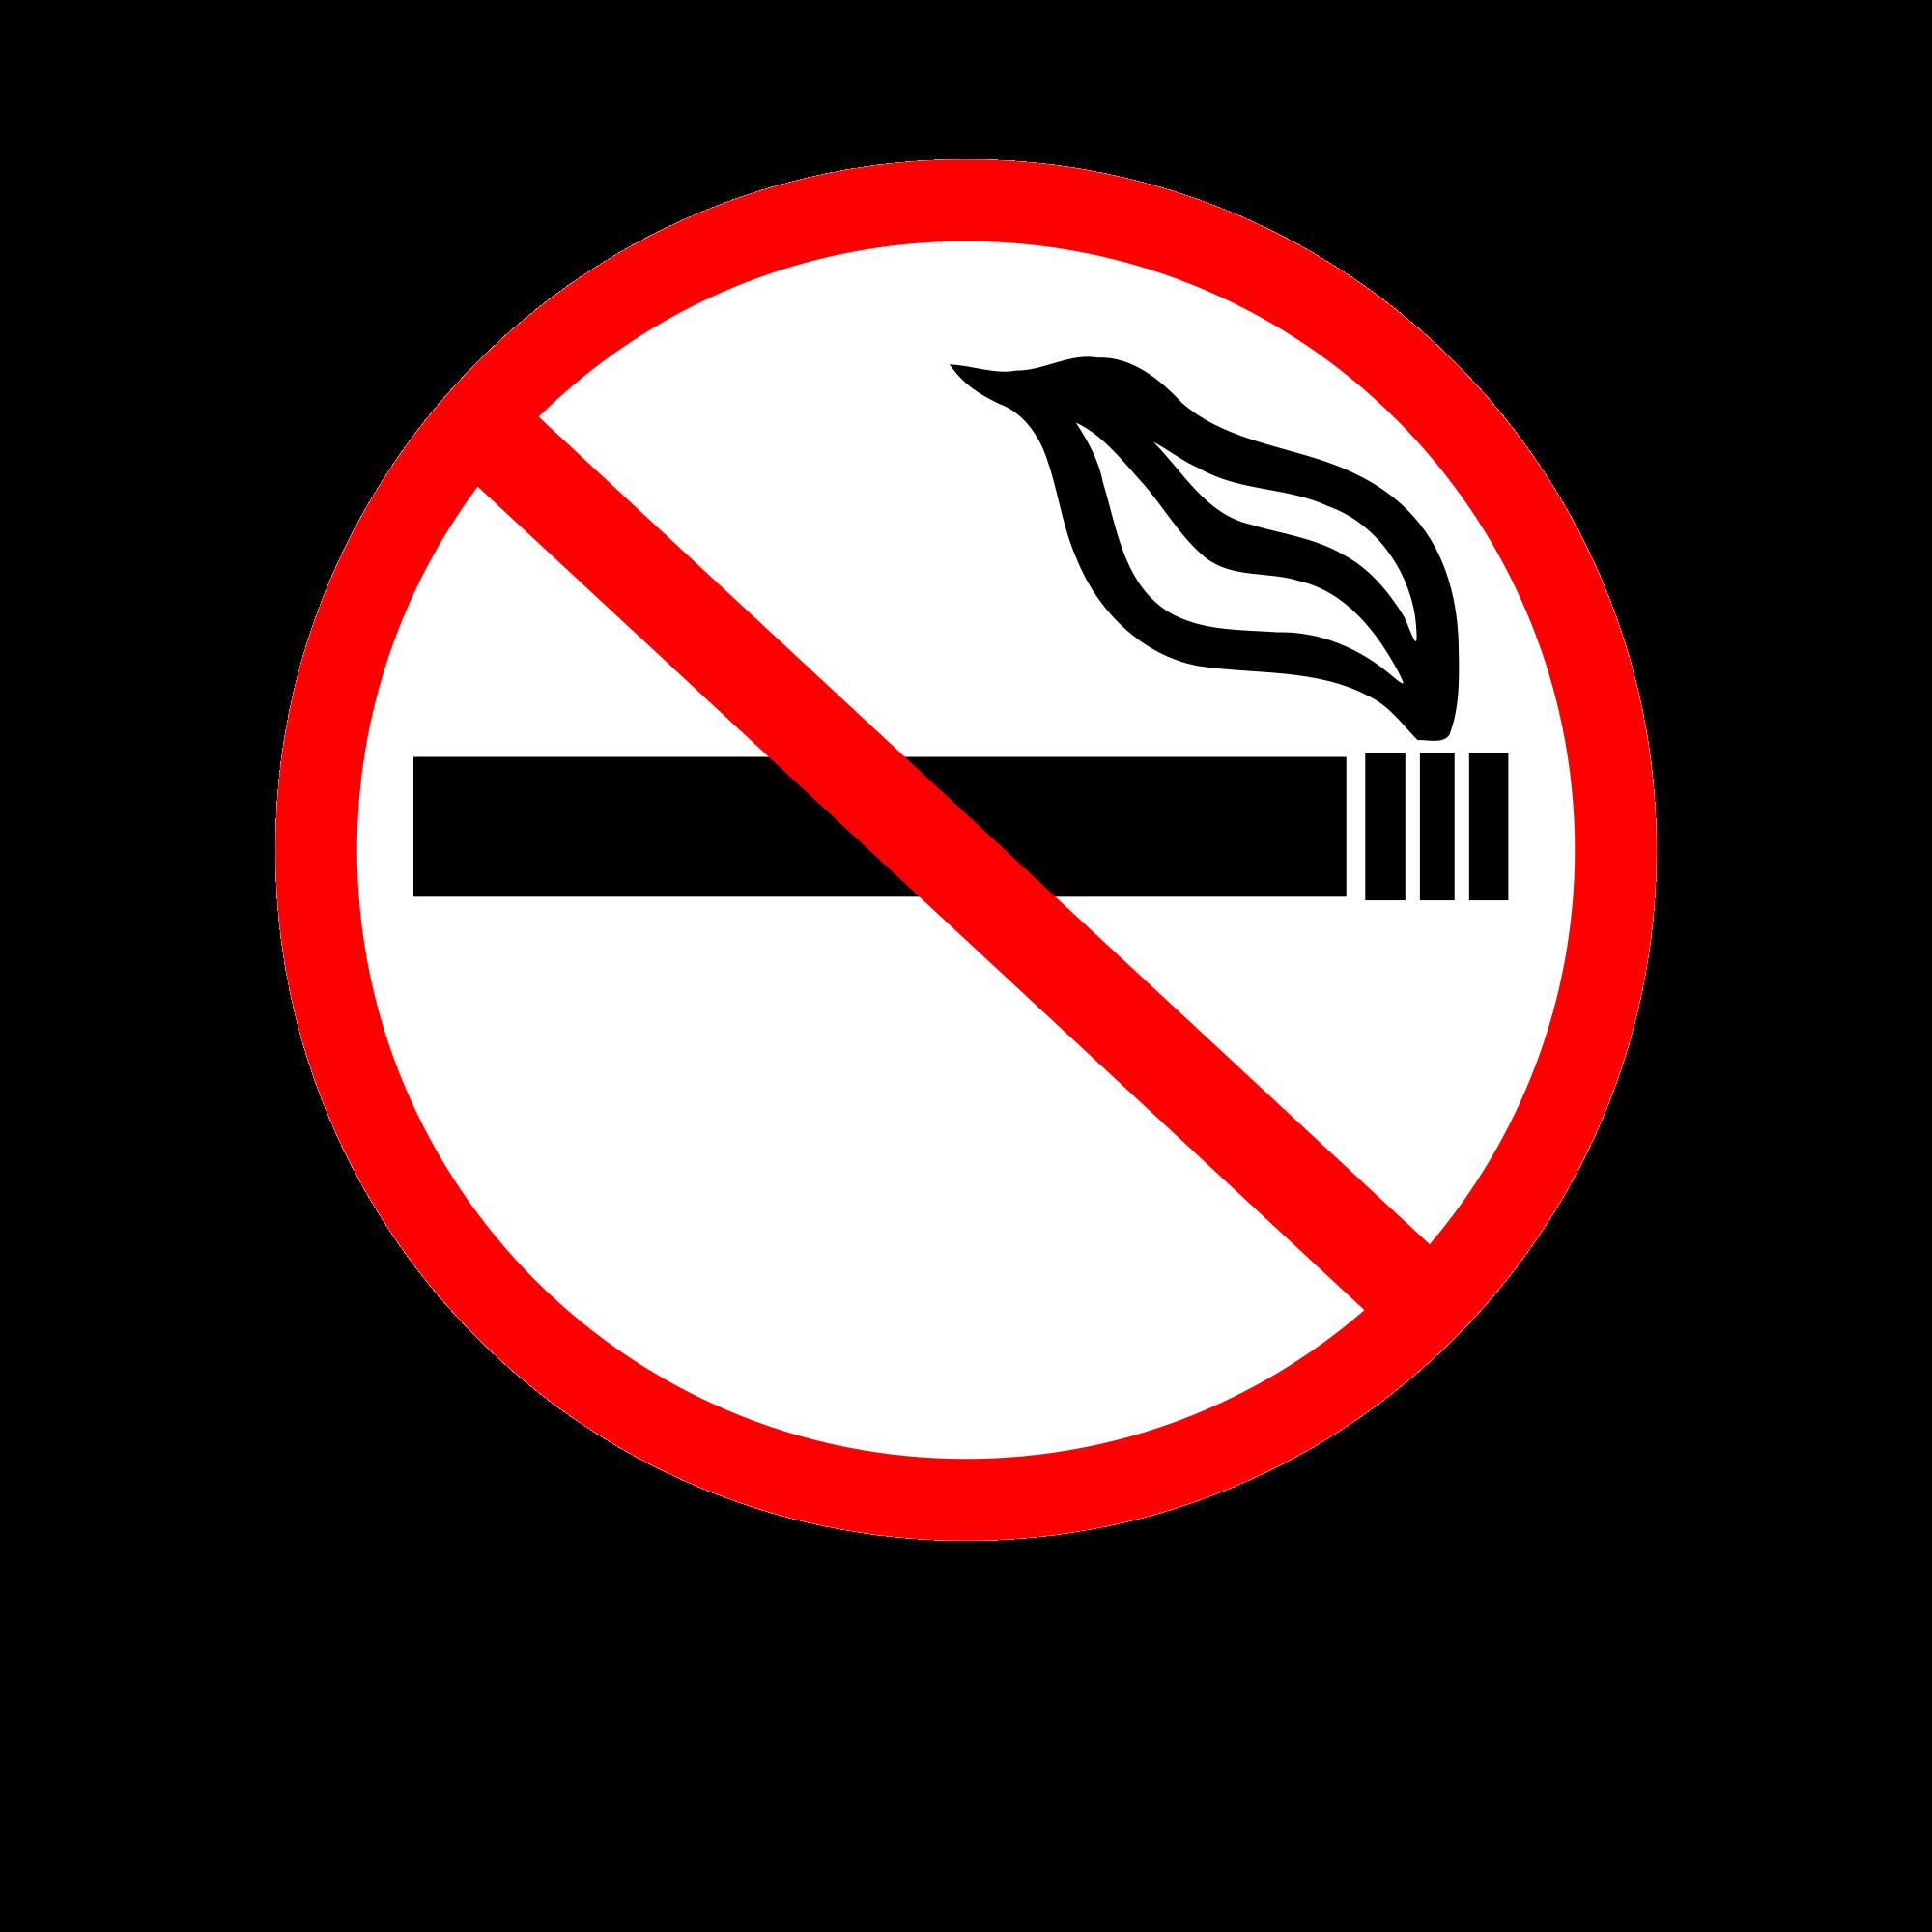 clip art download Banned transparent website. No smoking sign clipart